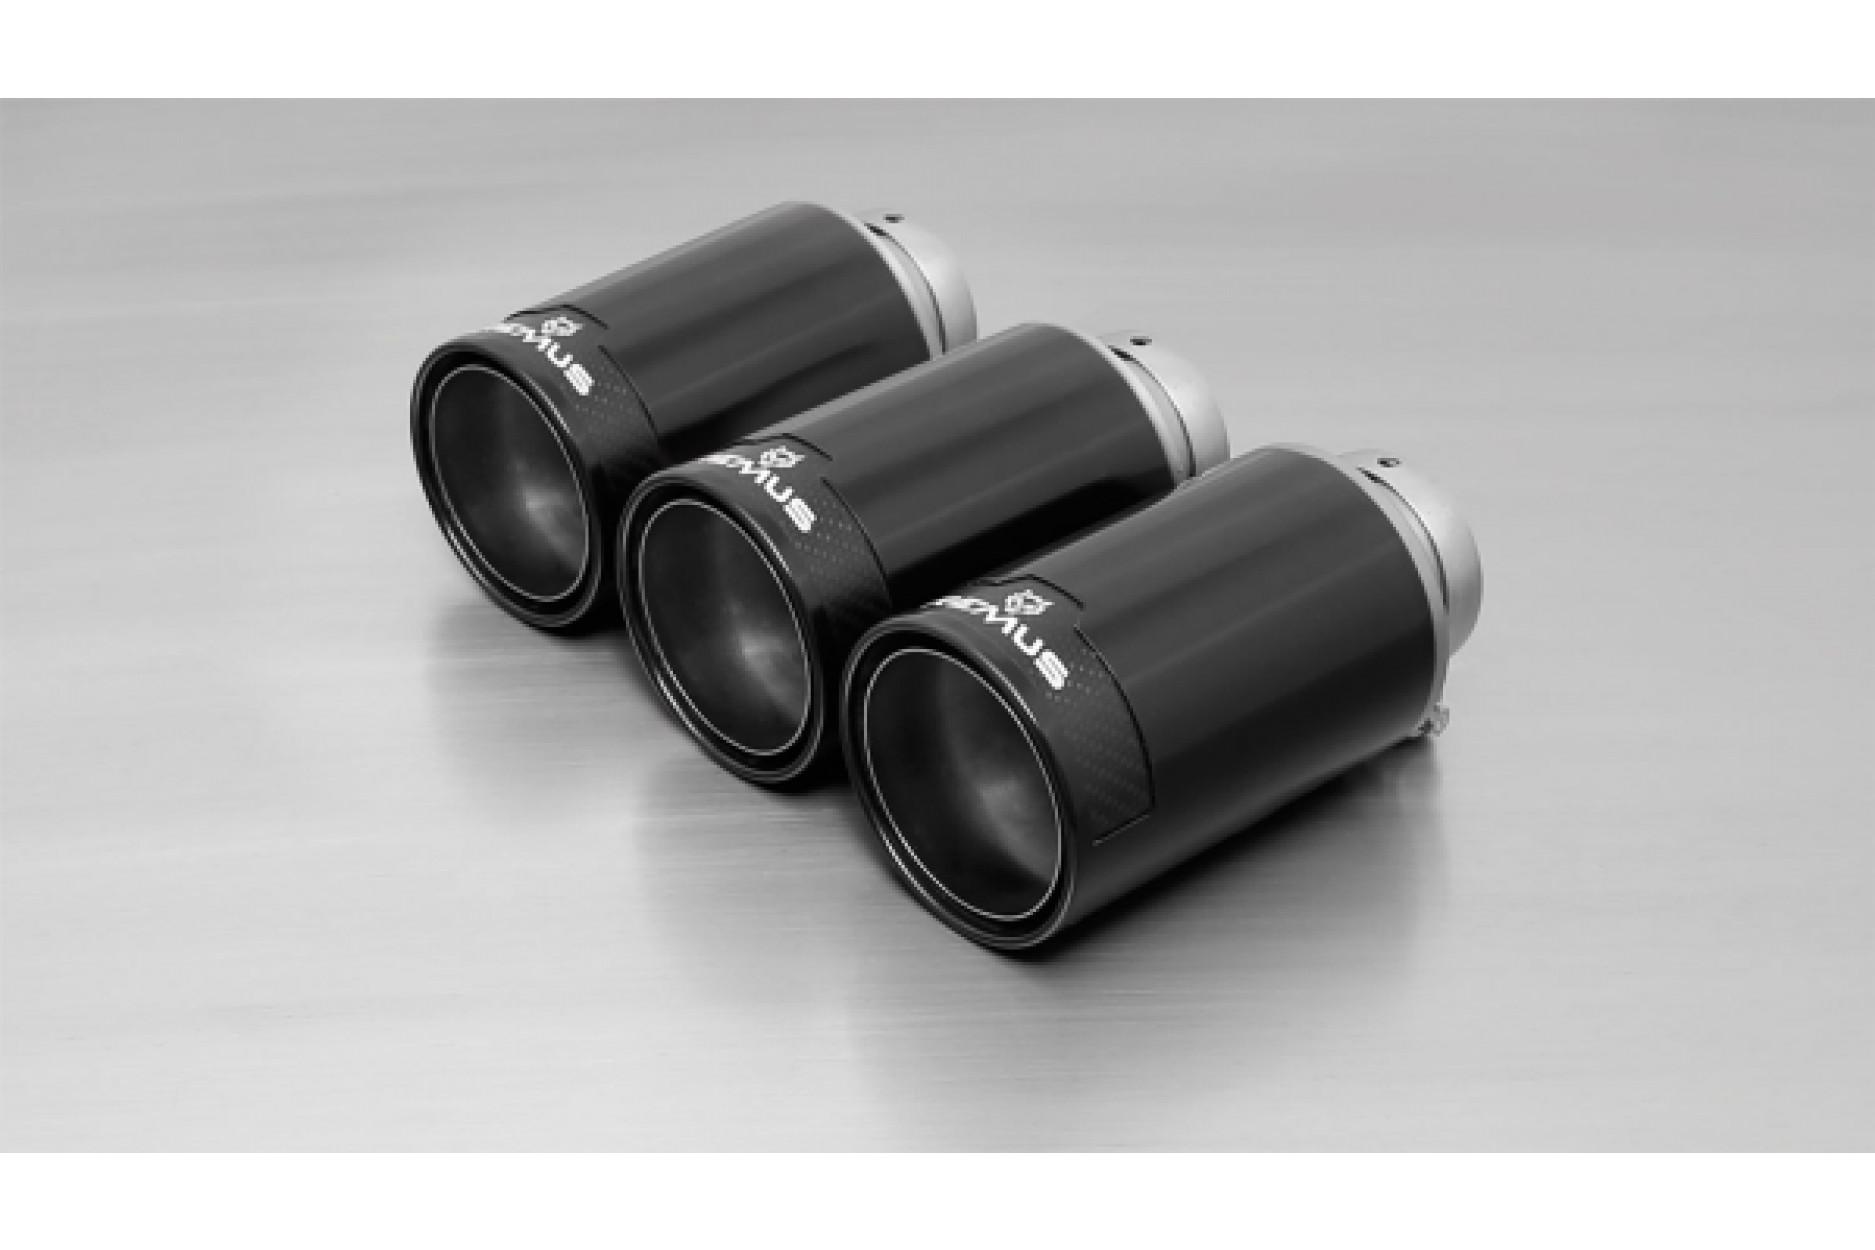 Remus 0036 98CB Endrohr-Set 3 x Ø 98 mm Street Race Black Chrome